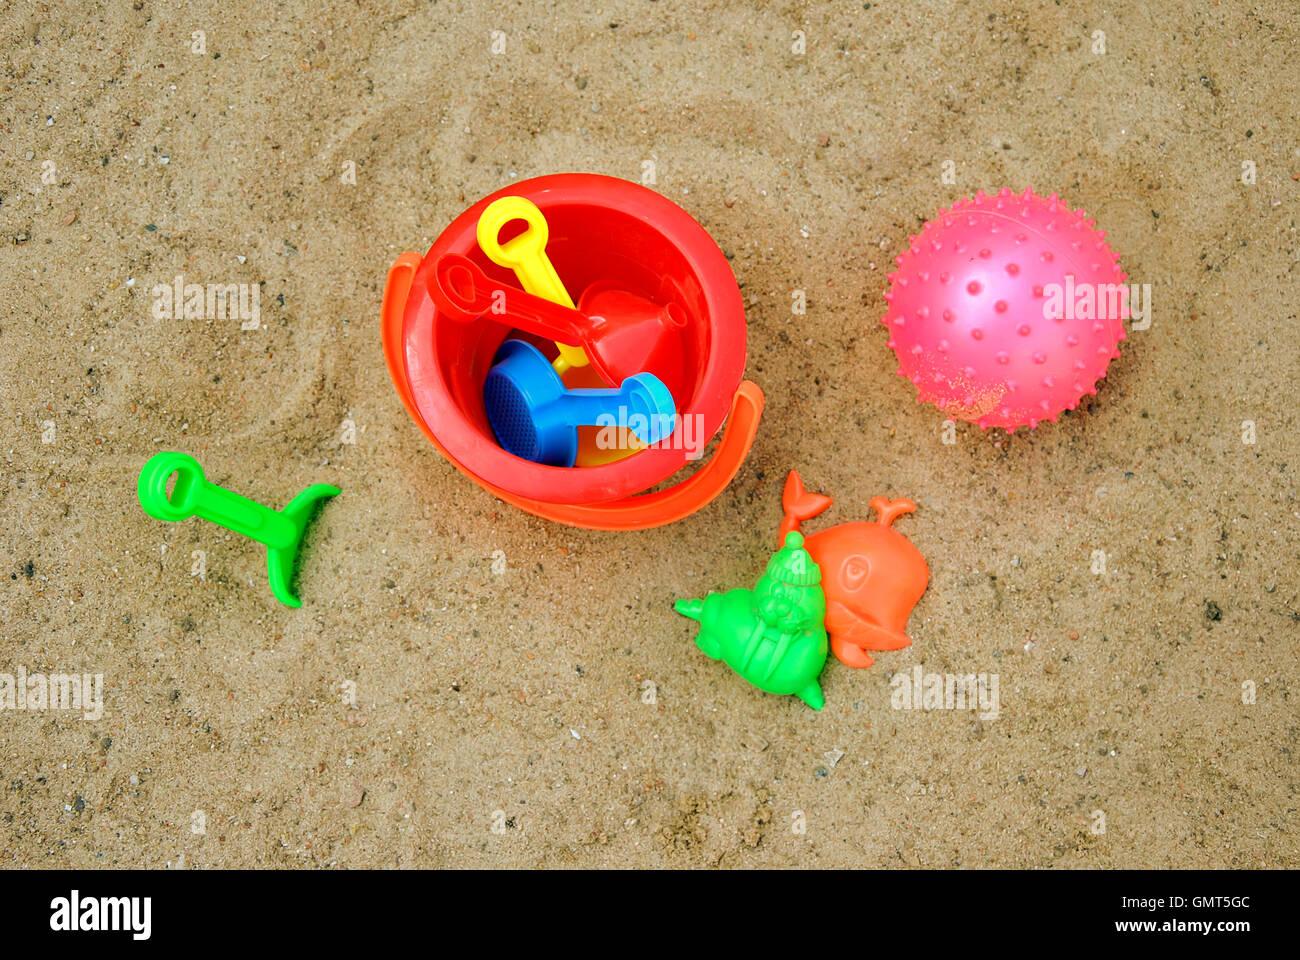 Sandbox with toys - Stock Image